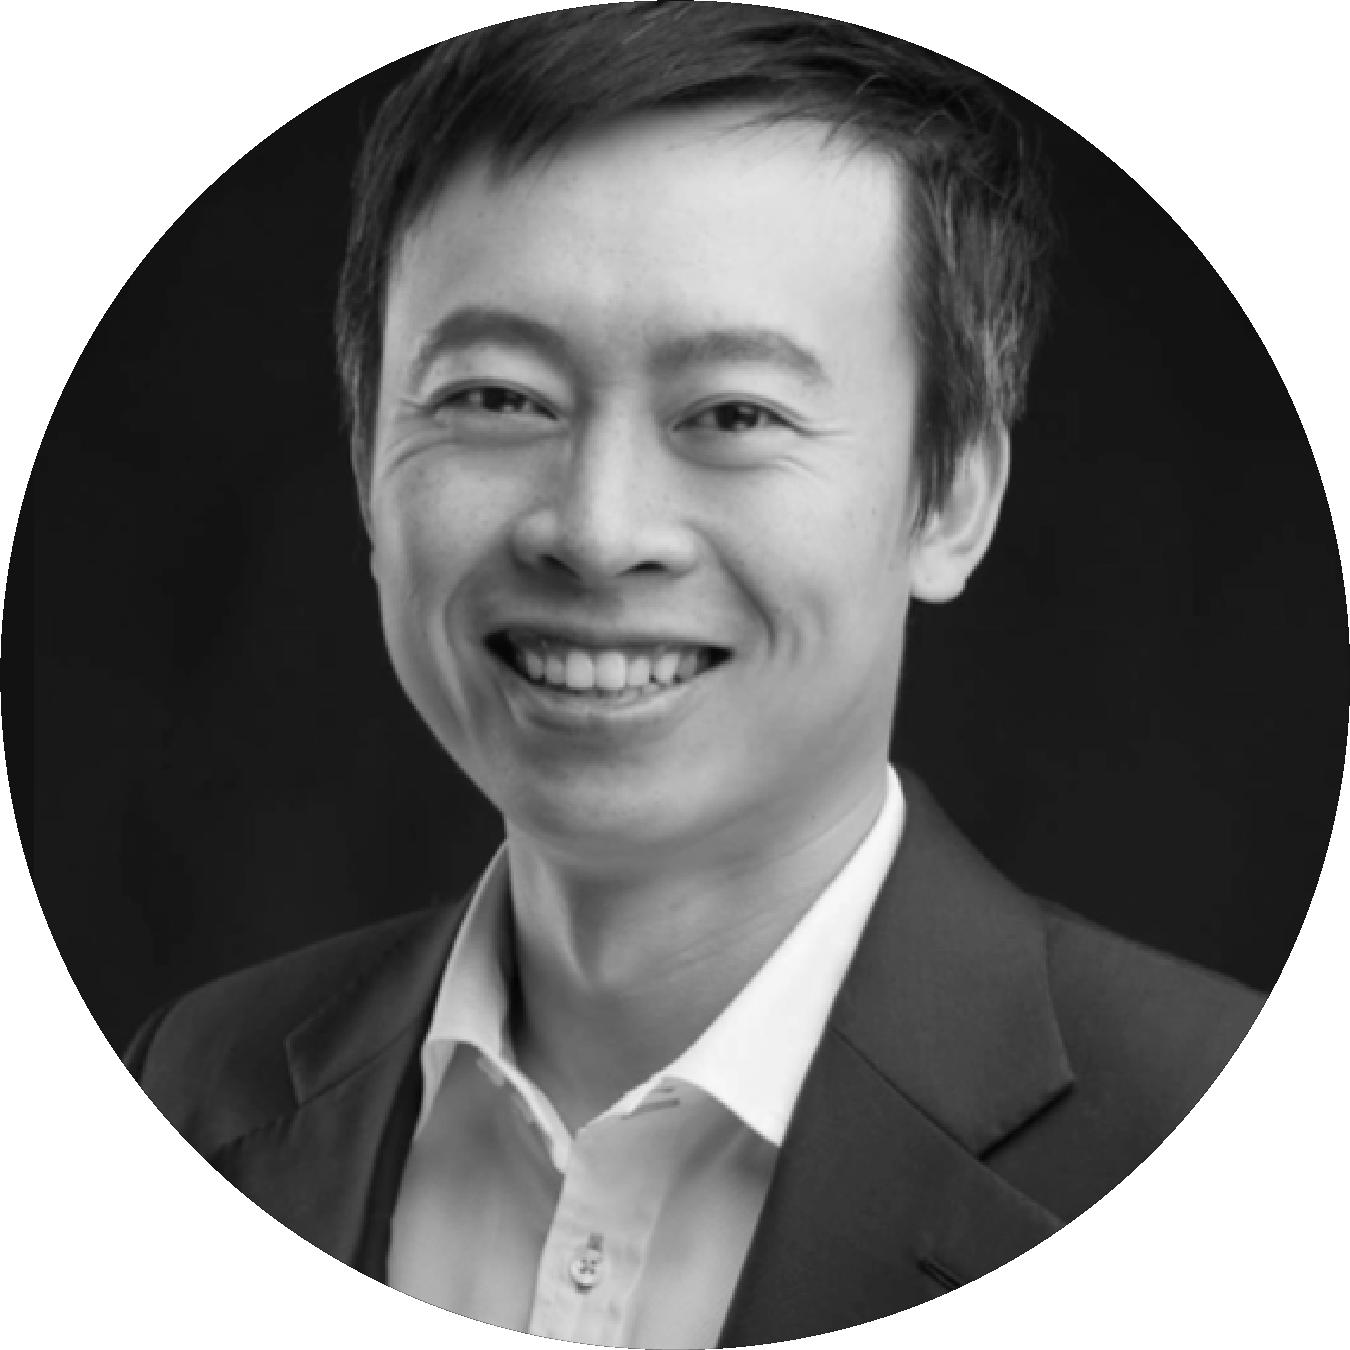 Nick Chen - 最高財務責任者(CFO)金融、ファンドマネジメント、ベンチャーキャピタル のエキスパートNexus Global Investment の創業者とGoldman Sachs Japan などを歴任